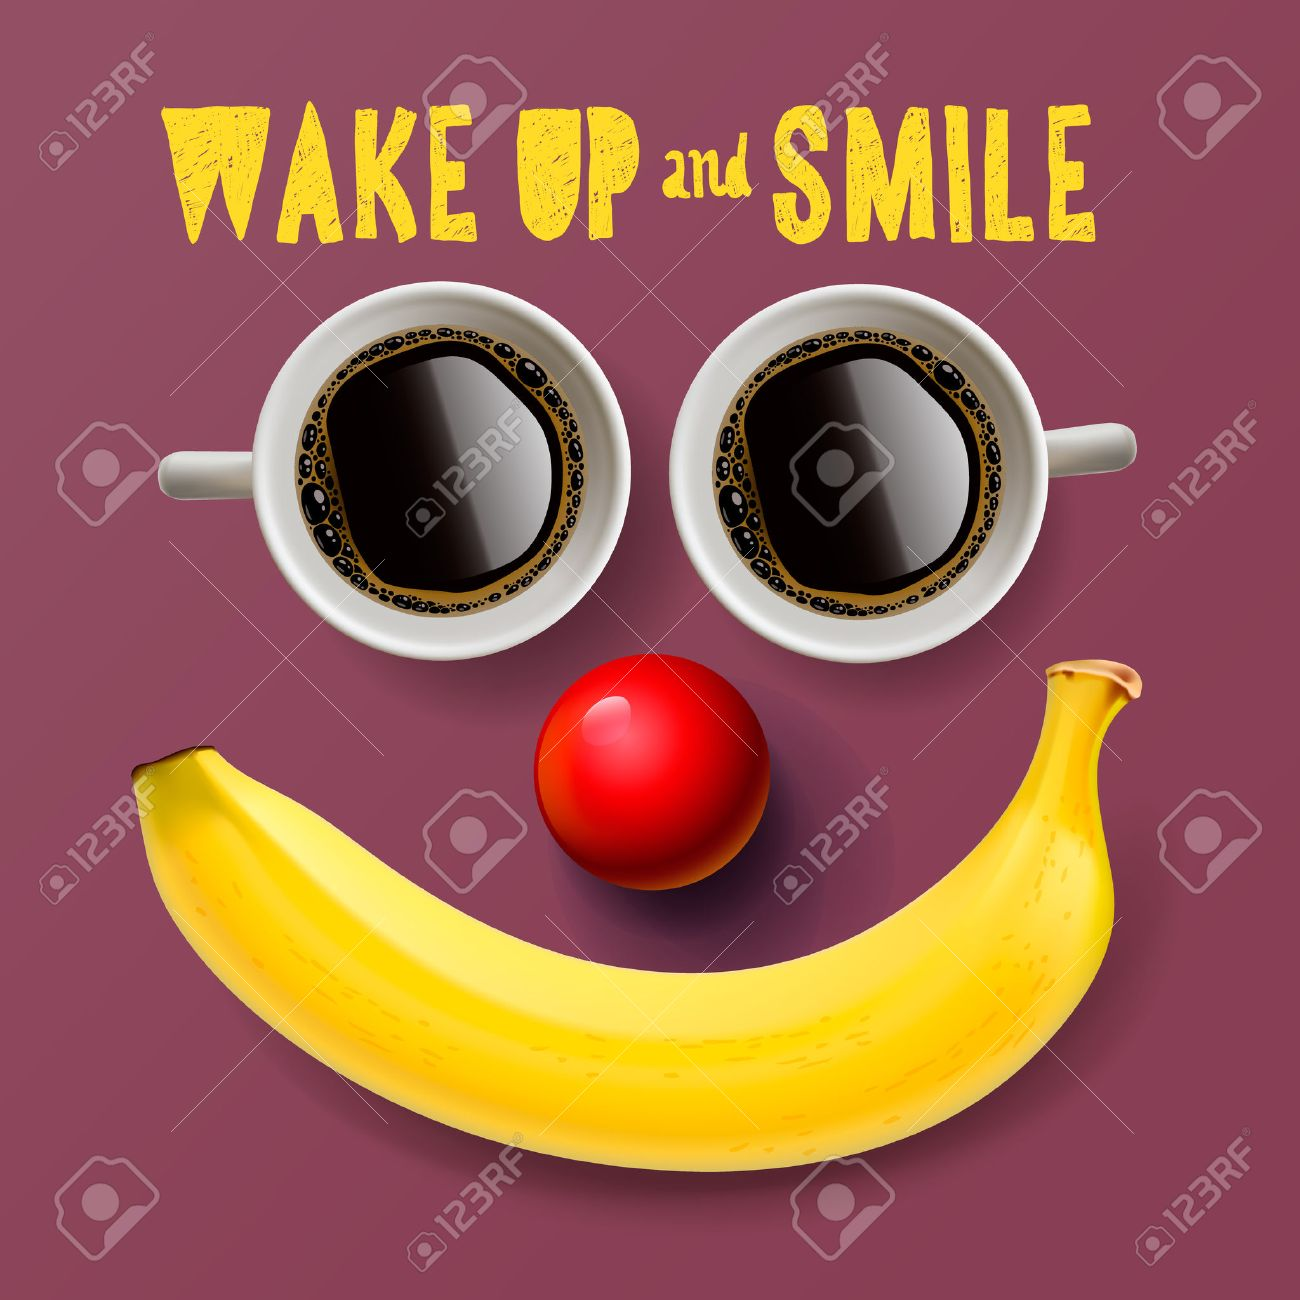 Wake up and smile, motivation background, vector illustration. - 47683092